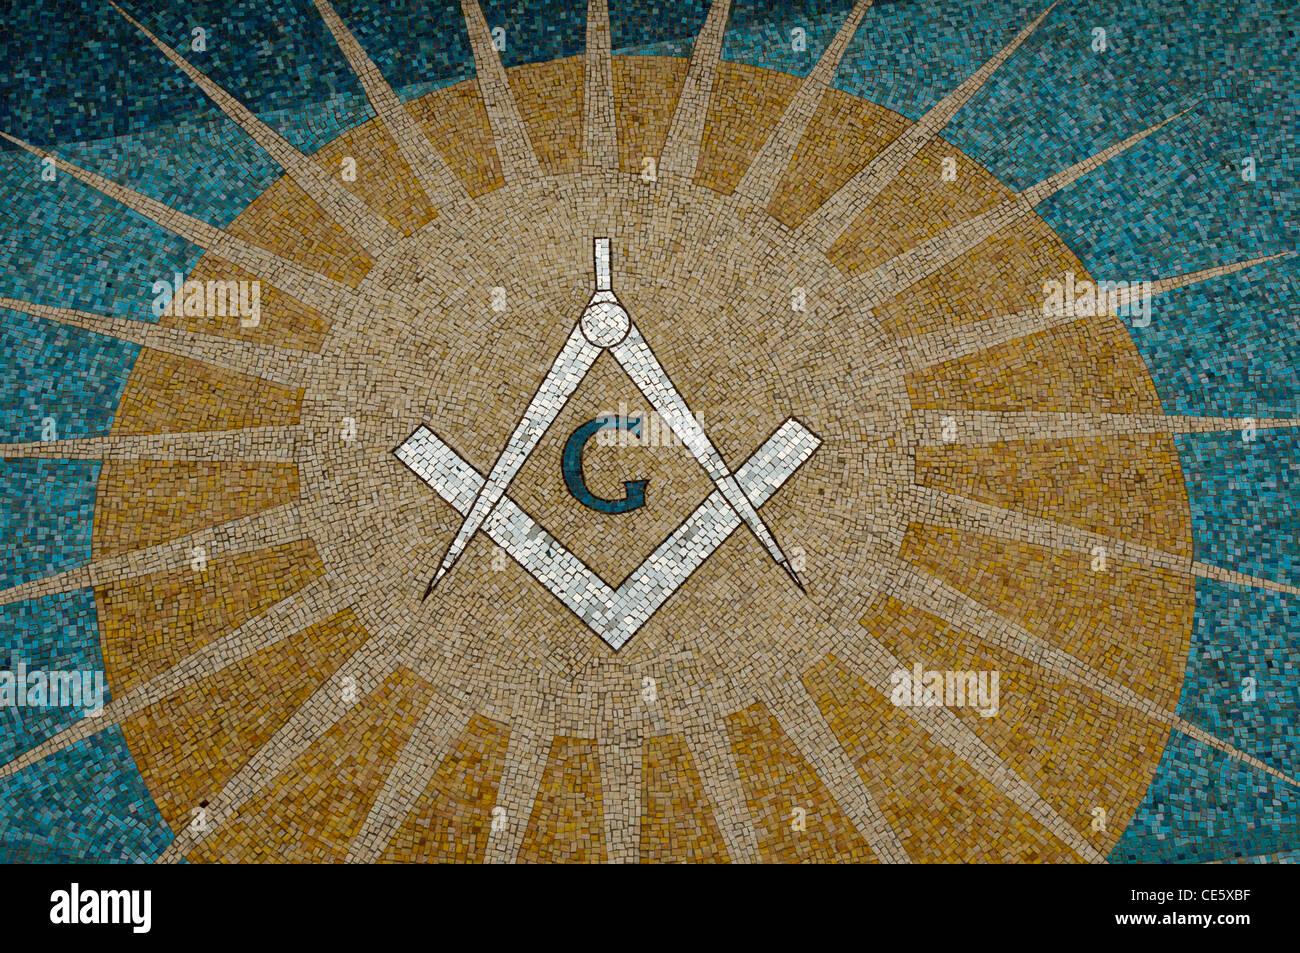 Square and Compasses and sun mosaic on the wall of Grand Lodge of Massachusetts, Boston, United States, USA, freemasonry - Stock Image